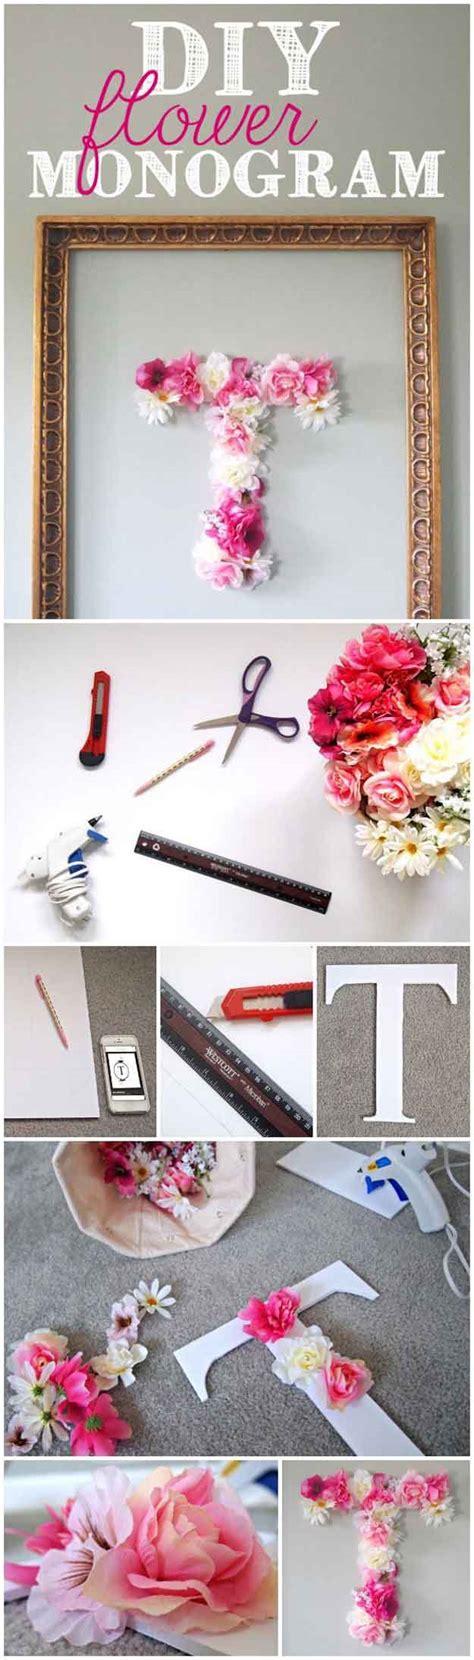 Diy Bedroom Decor Ideas 37 Insanely Bedroom Ideas For Diy Decor Crafts For